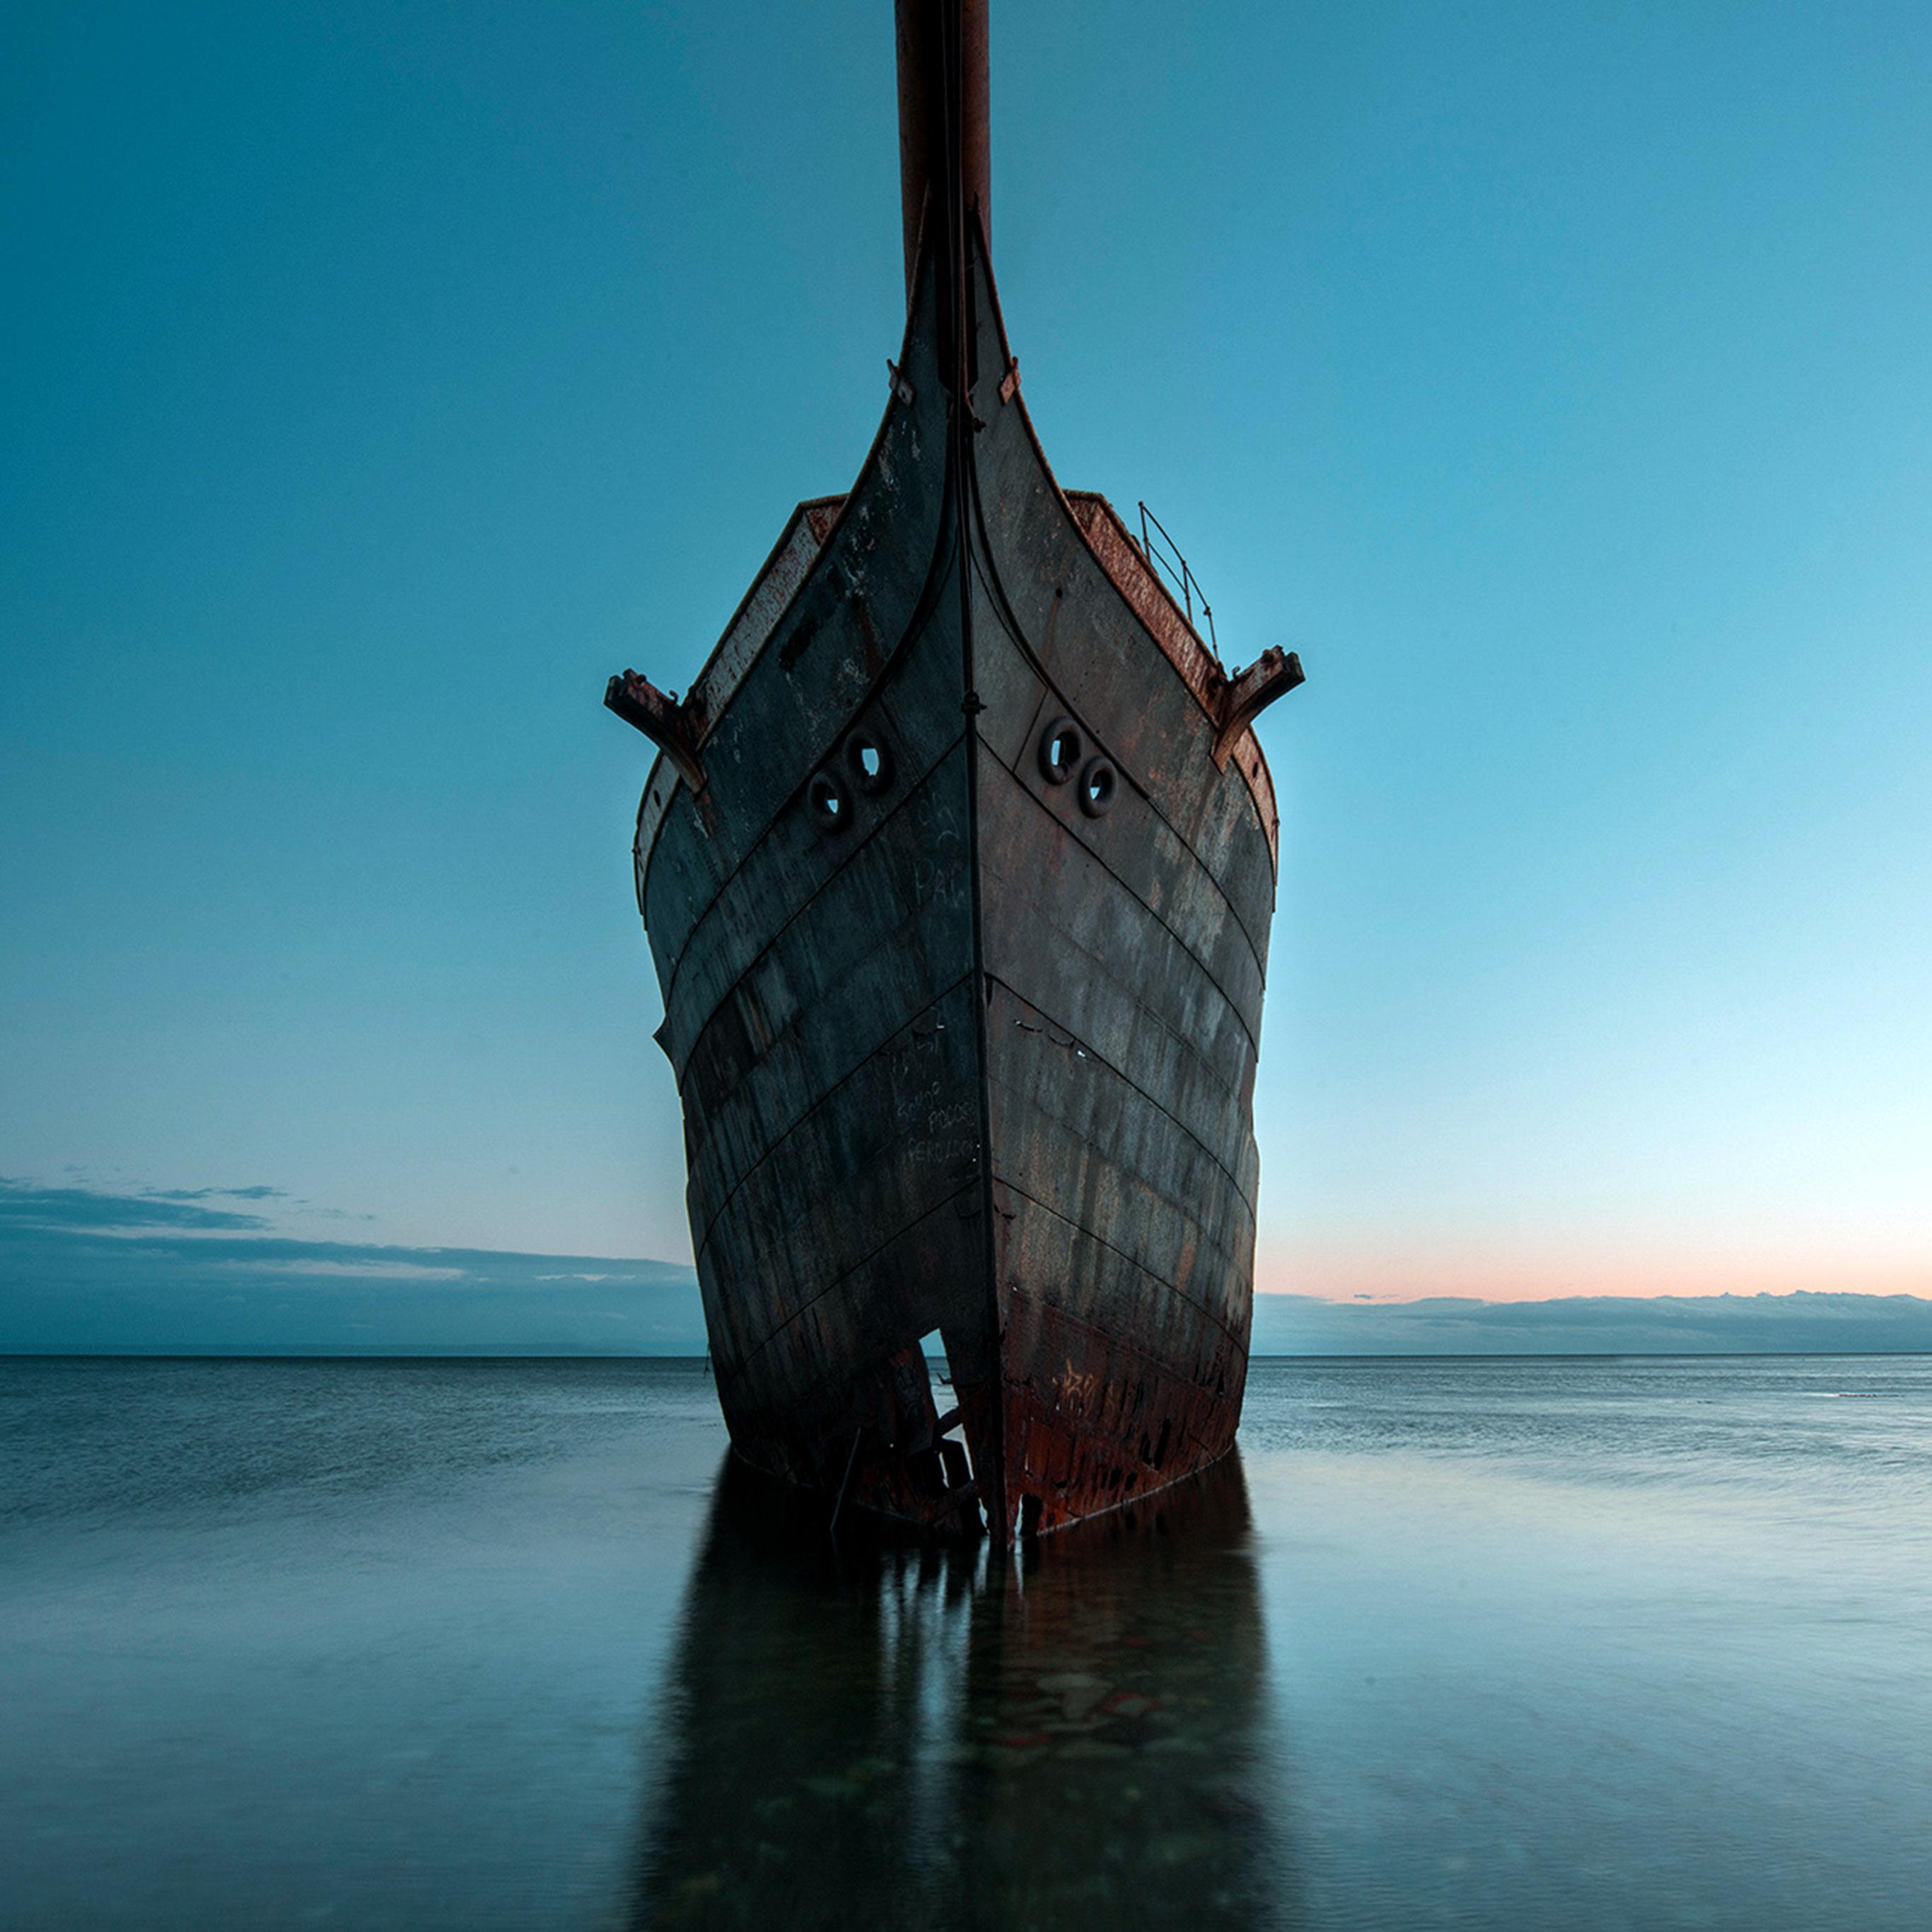 Bh28 Boat Ship Sea Blue Art Wallpaper